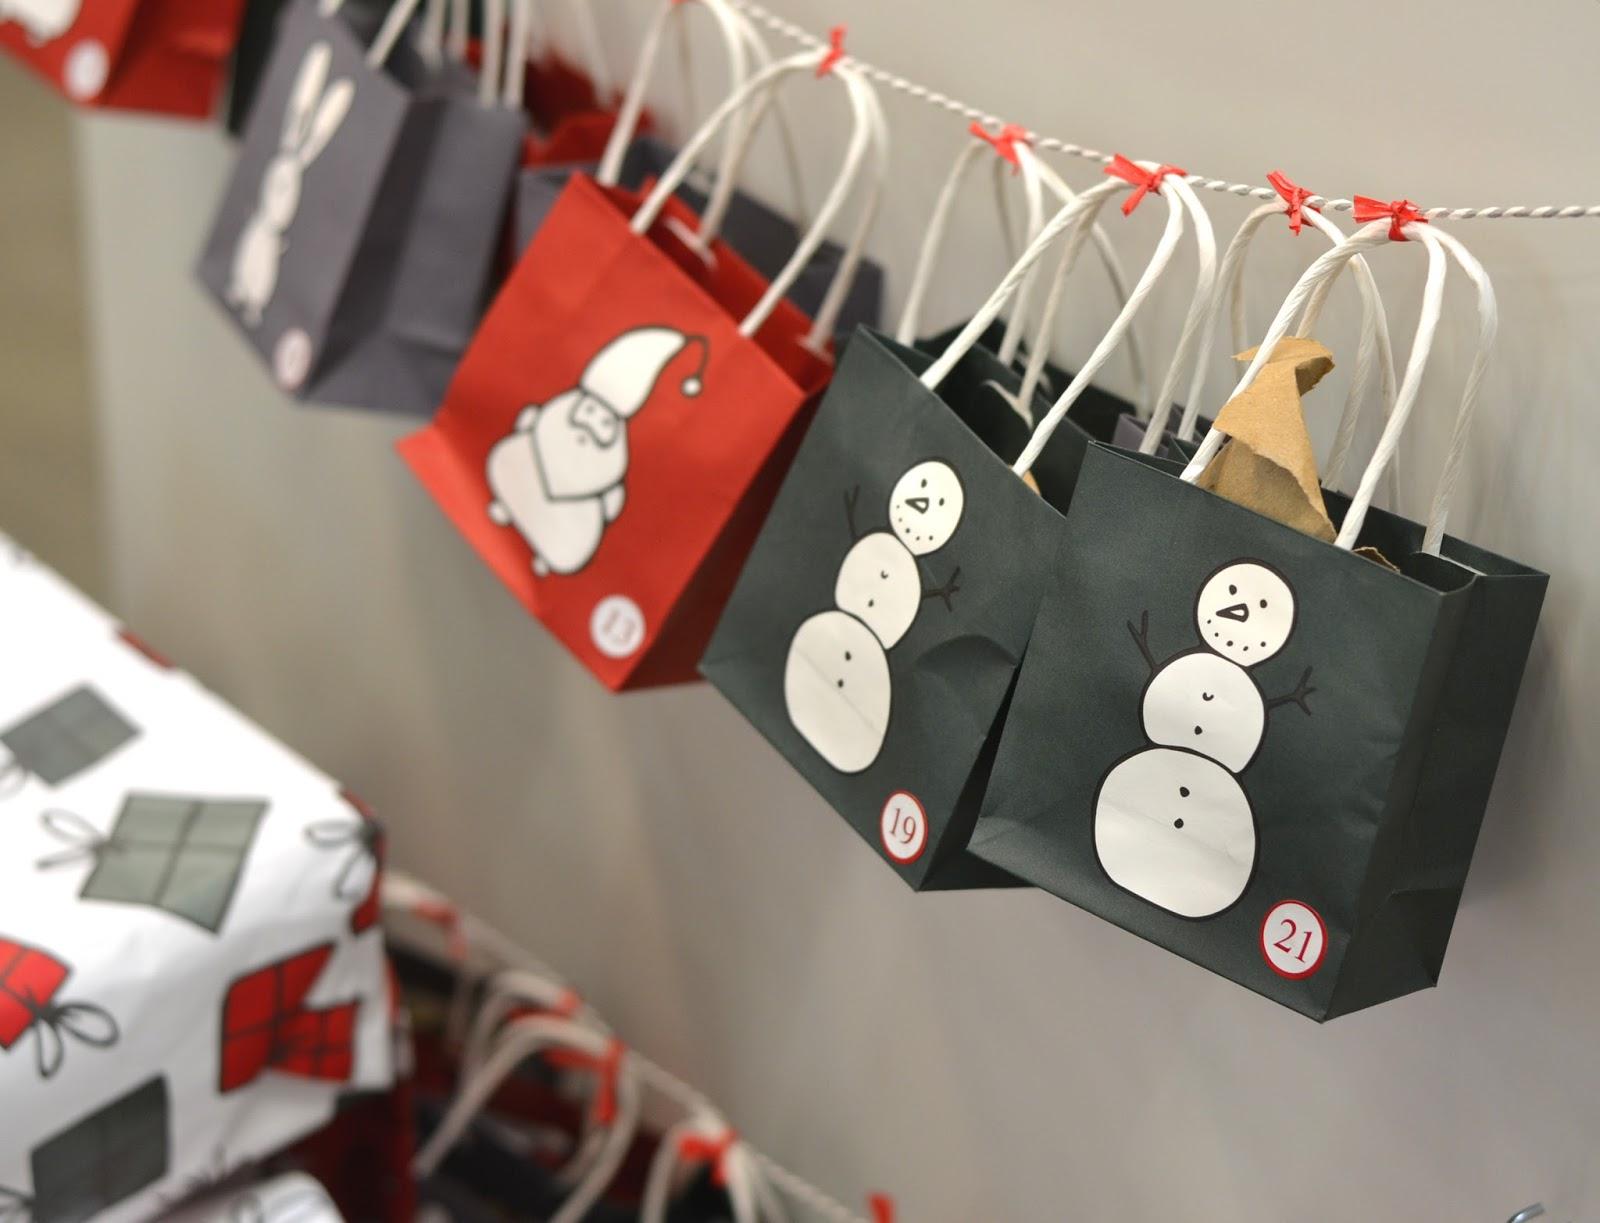 adventni kalendar ikea ORDINARY LIFE: IKEA haul   vánoční inspirace adventni kalendar ikea